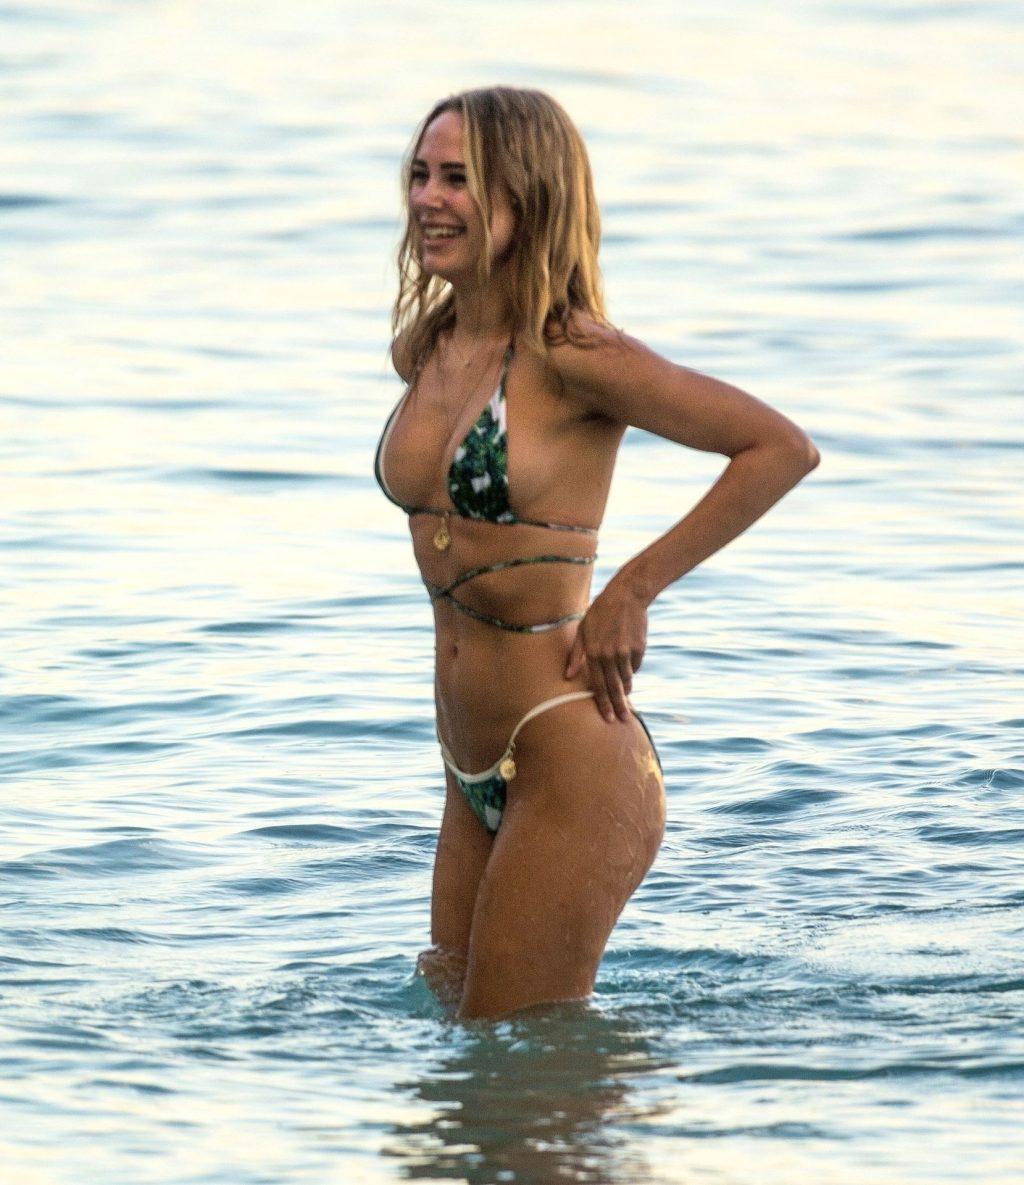 Kimberley Garner Stunts on the Beach in Her Palm Printed Bikini (63 Photos)